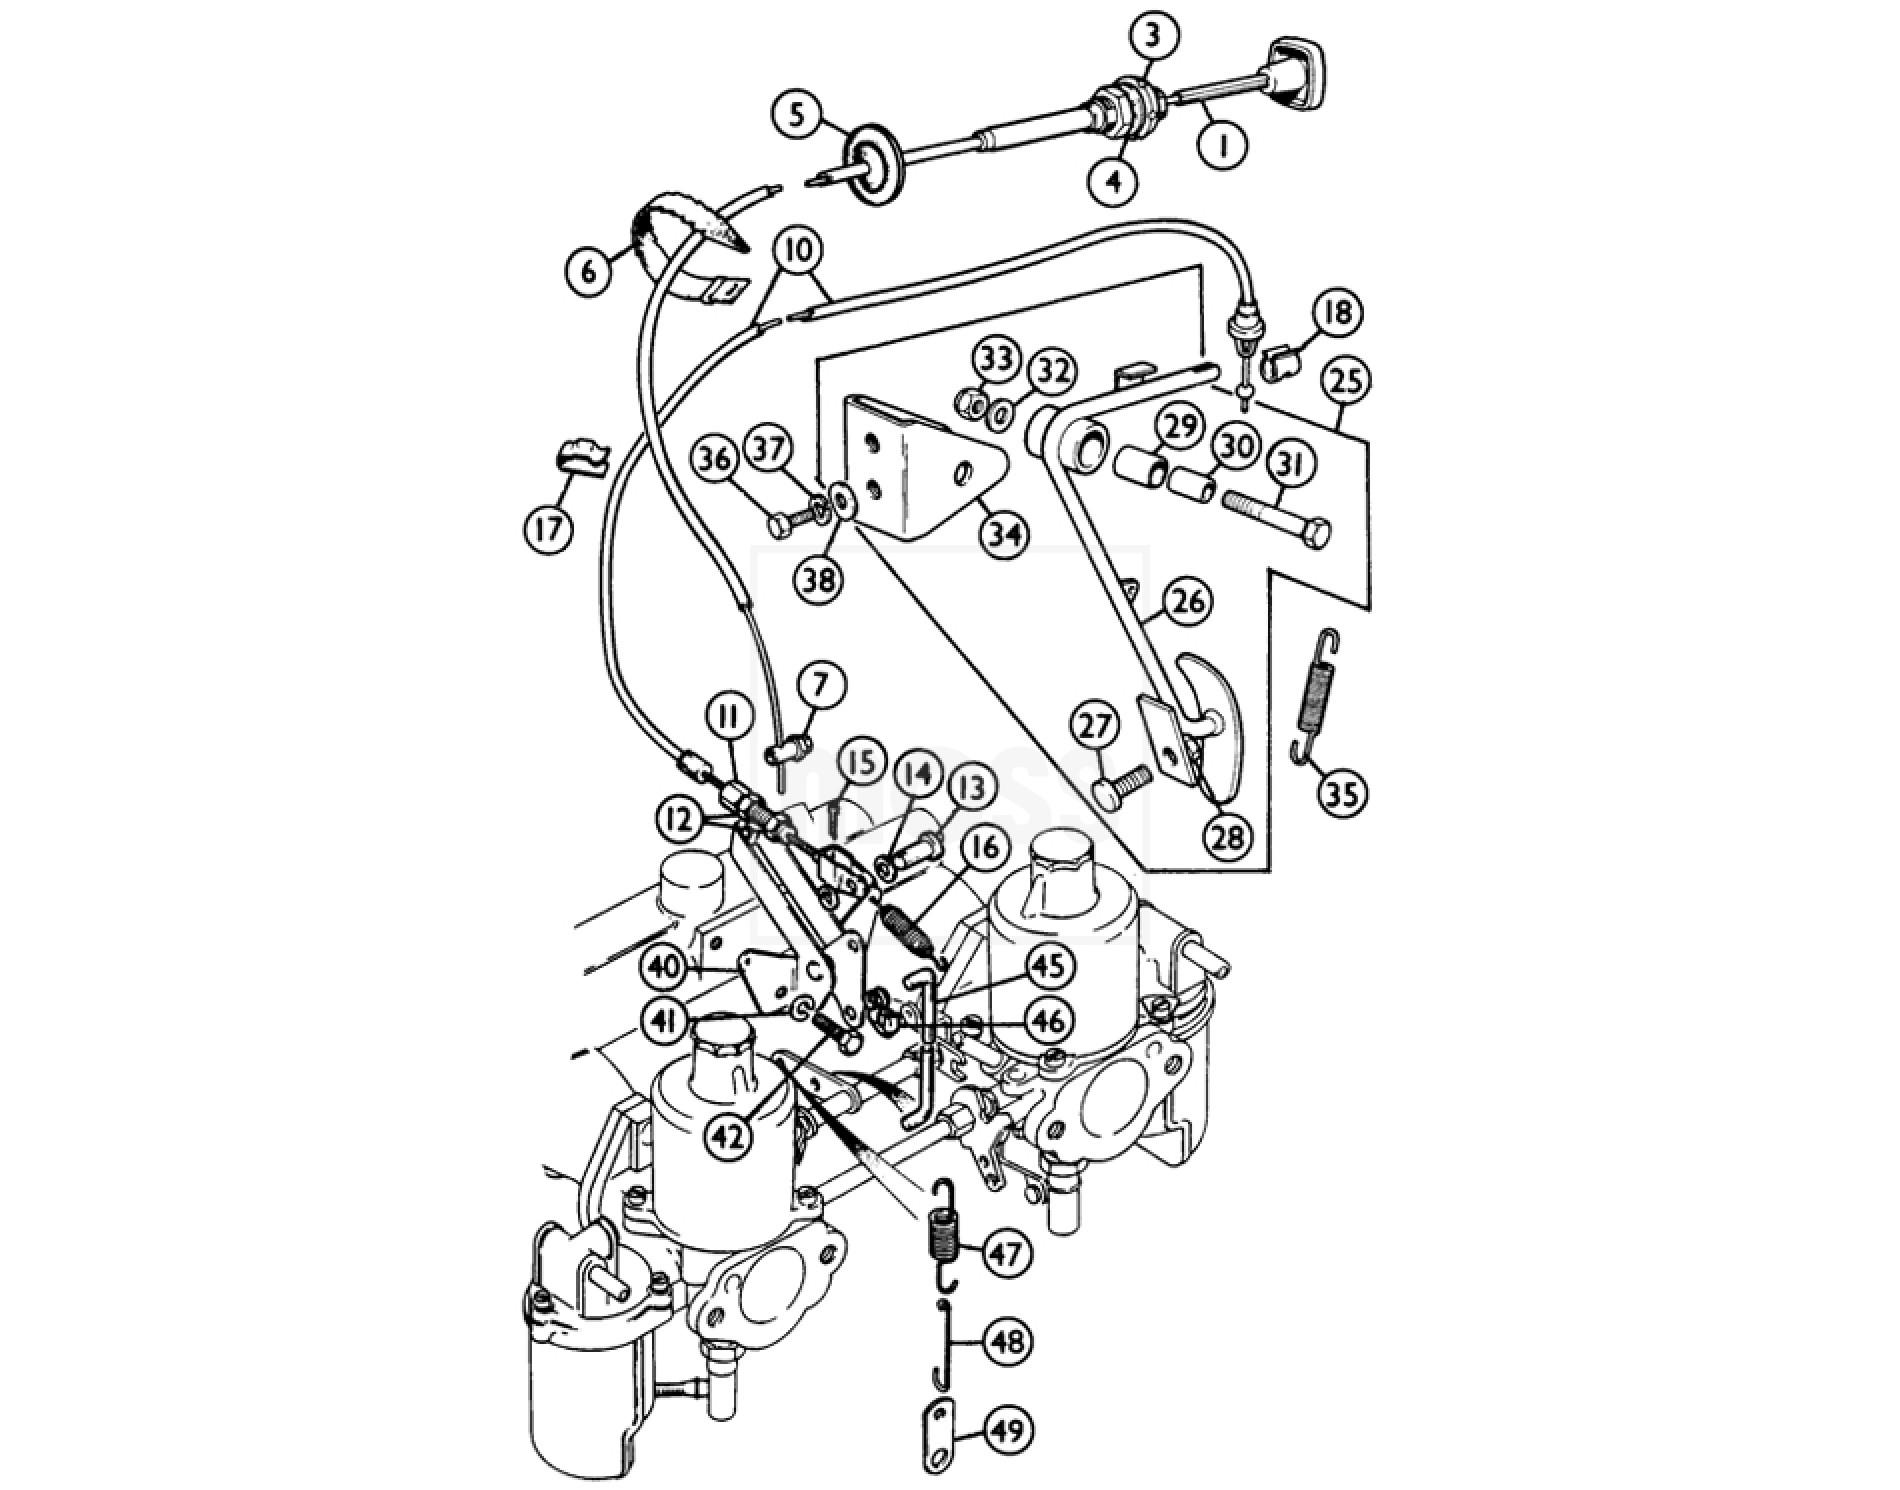 Accelerator Amp Choke Controls